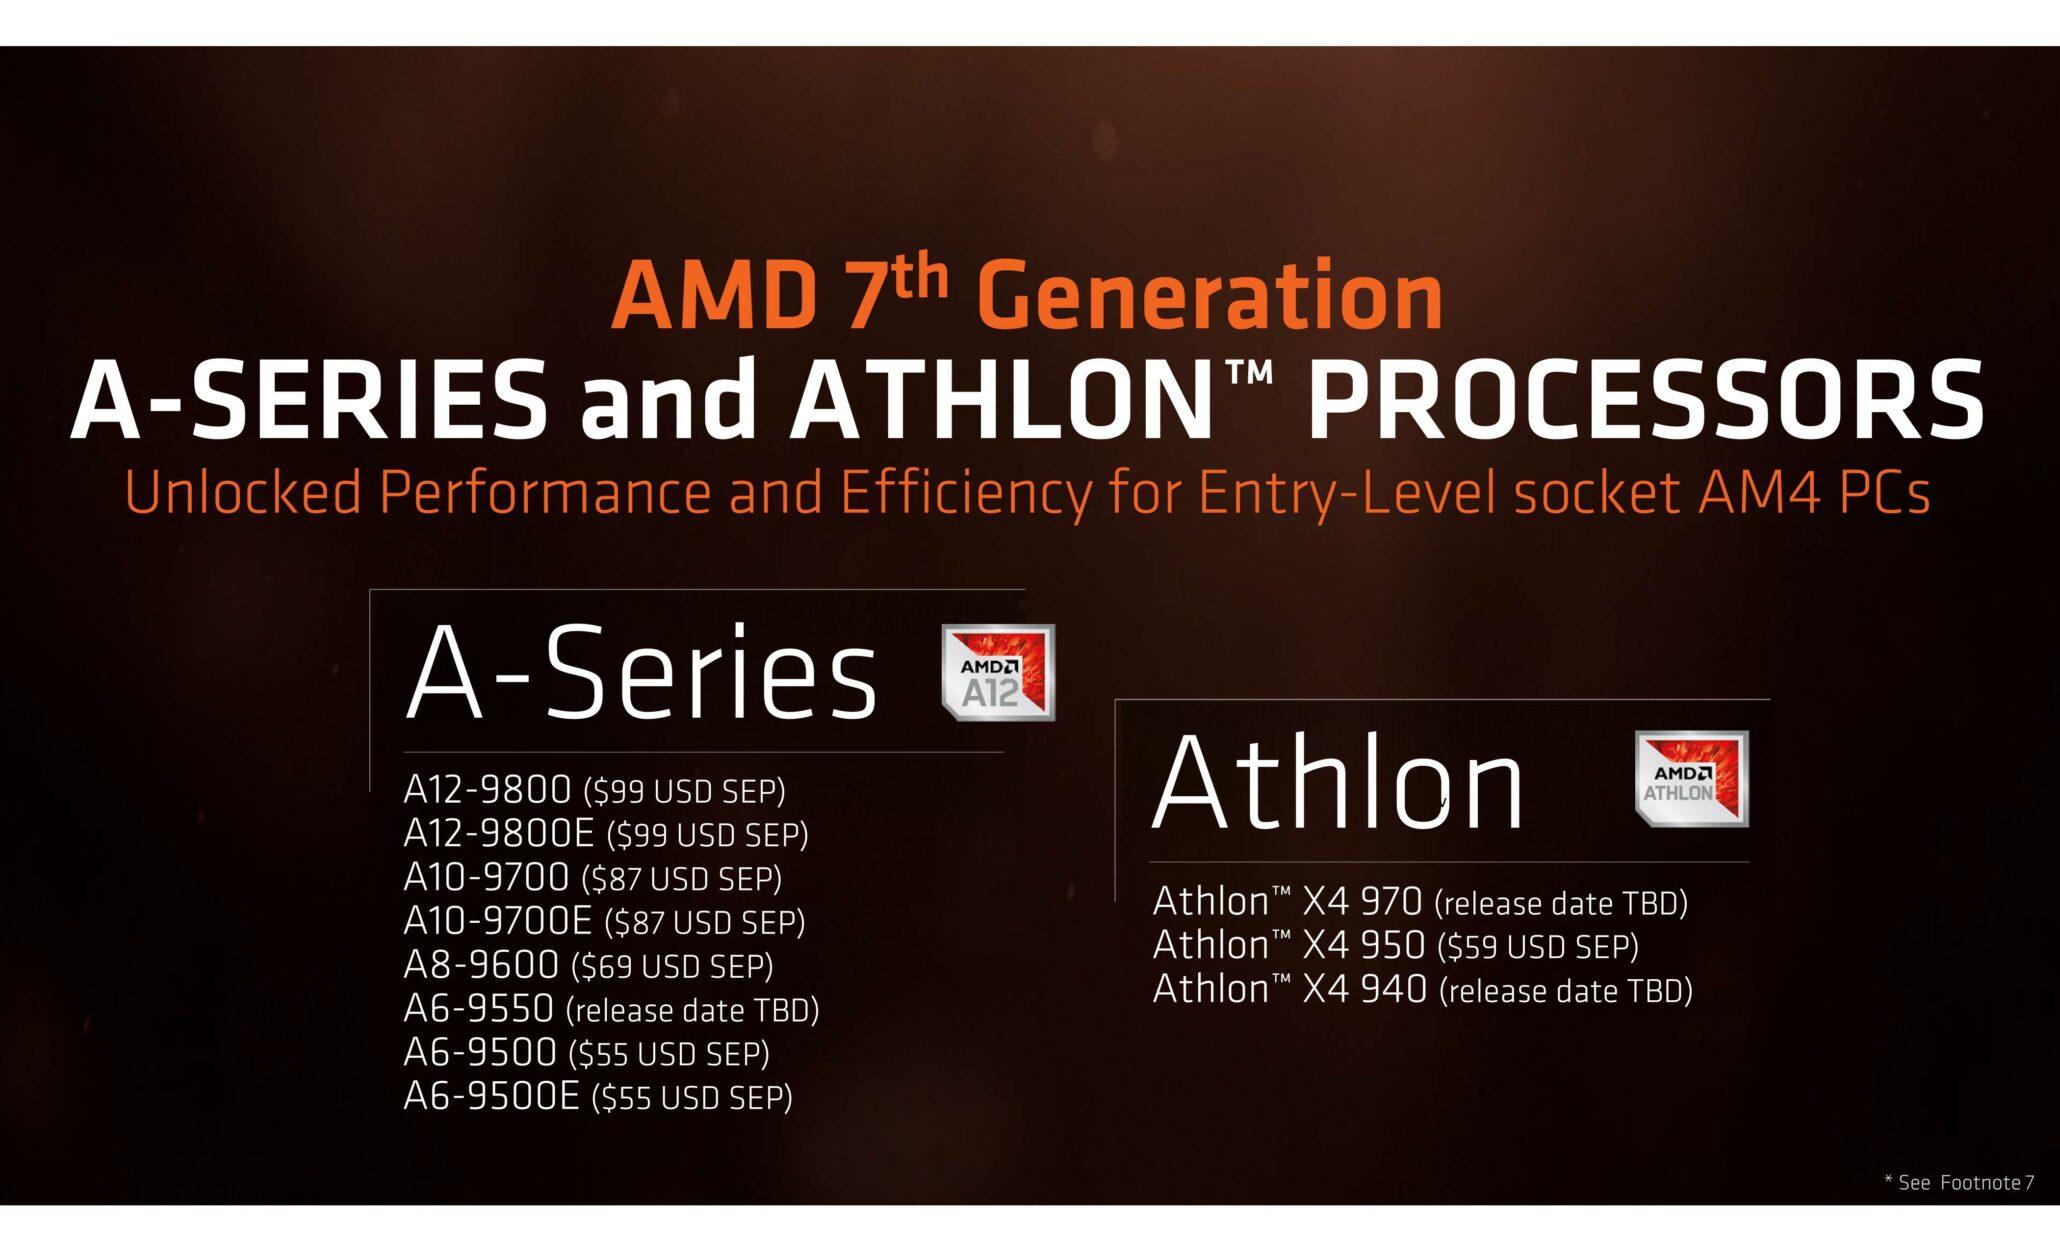 AMD A12 9800 R7 iGPU Performance Tested Against R7 250 dGPU